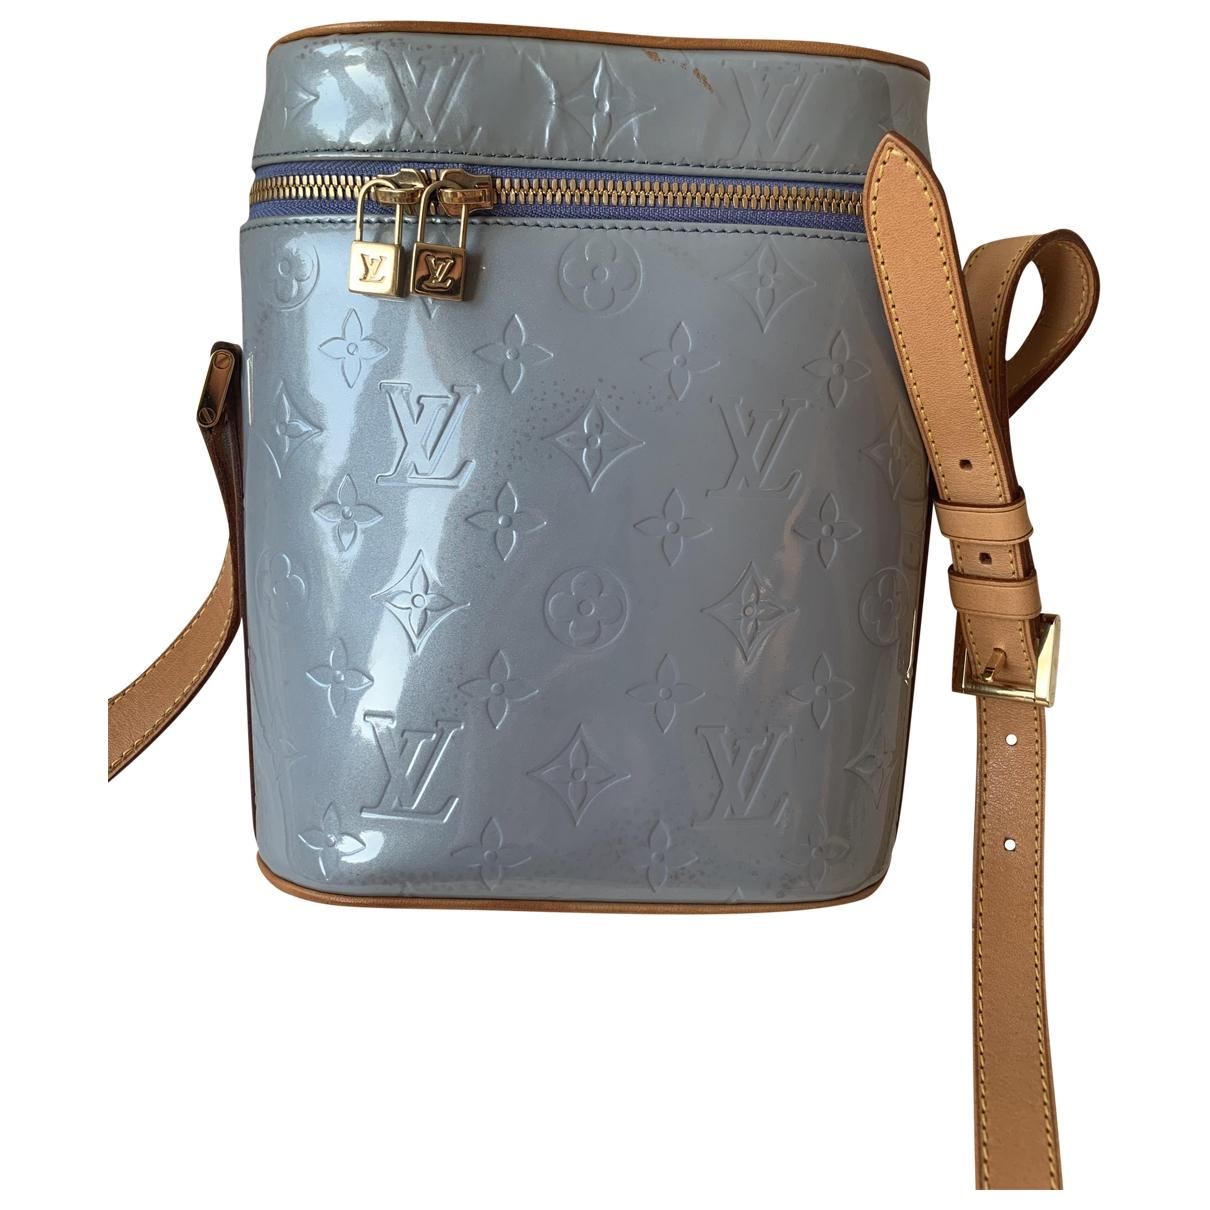 Louis Vuitton \N Blue Patent leather handbag for Women \N